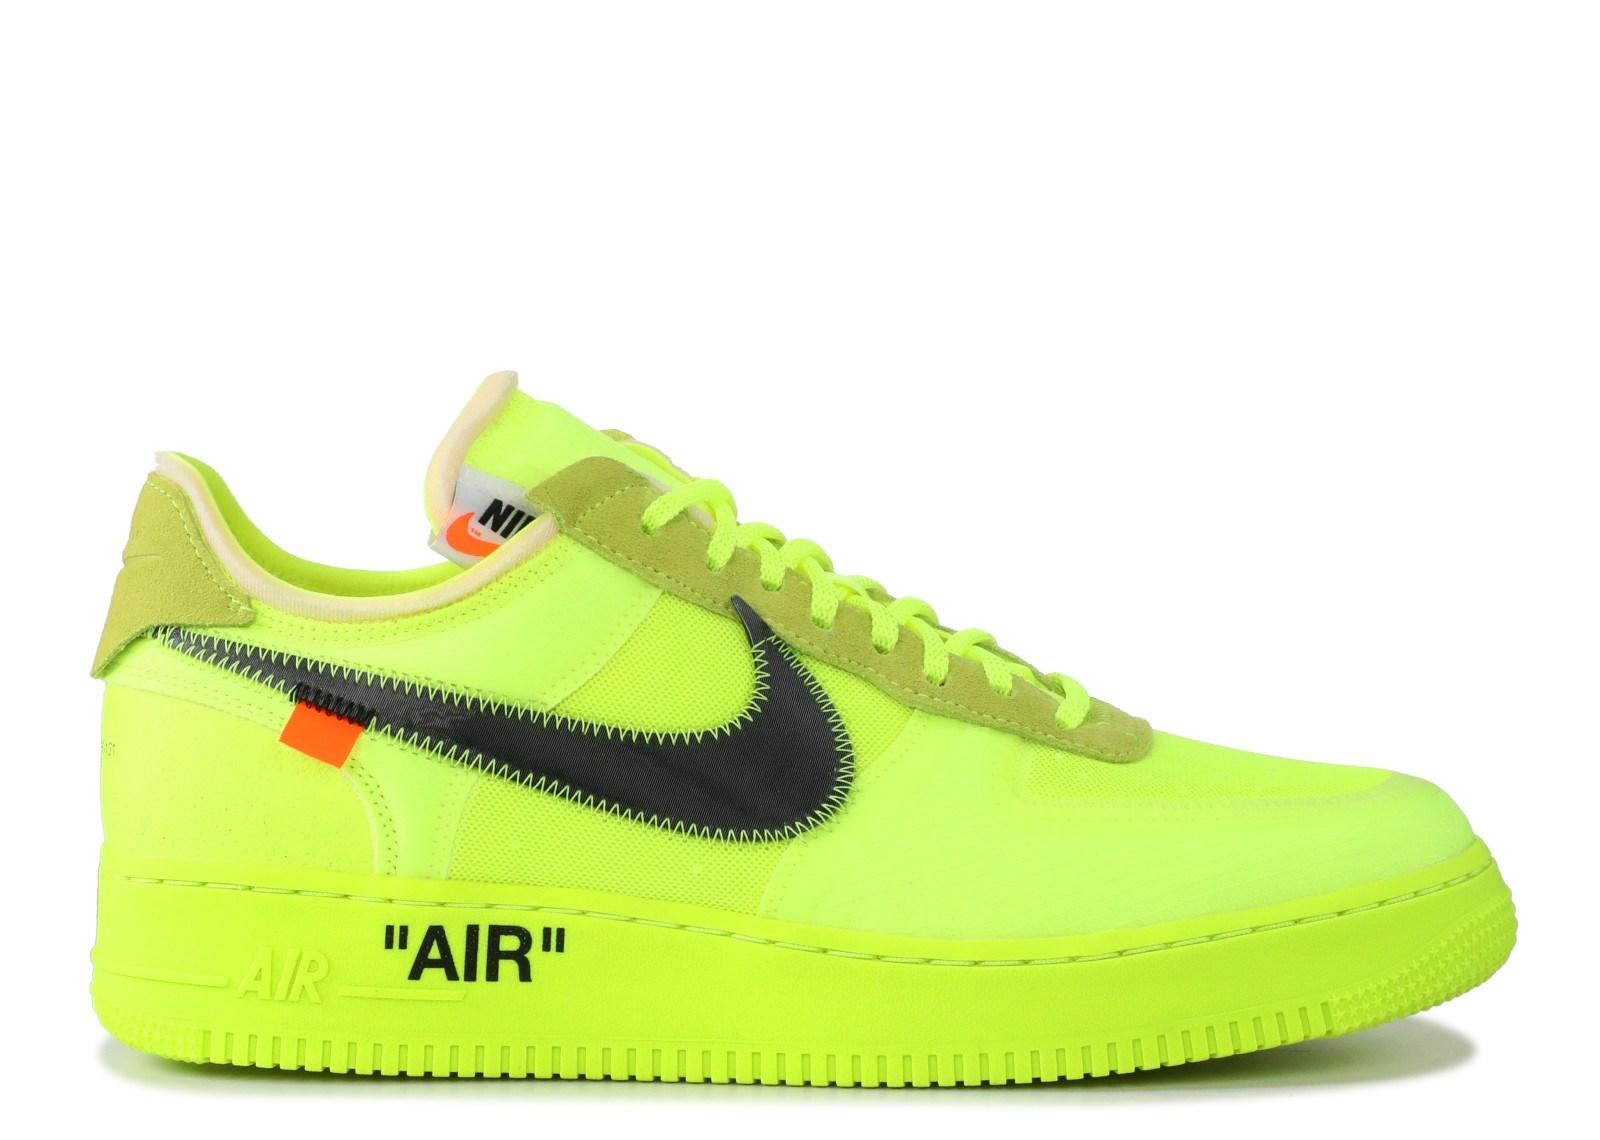 X Статьи Пары Интернет Sneakerhead Off WhiteВсе Блога Магазина Nike nwmN80v